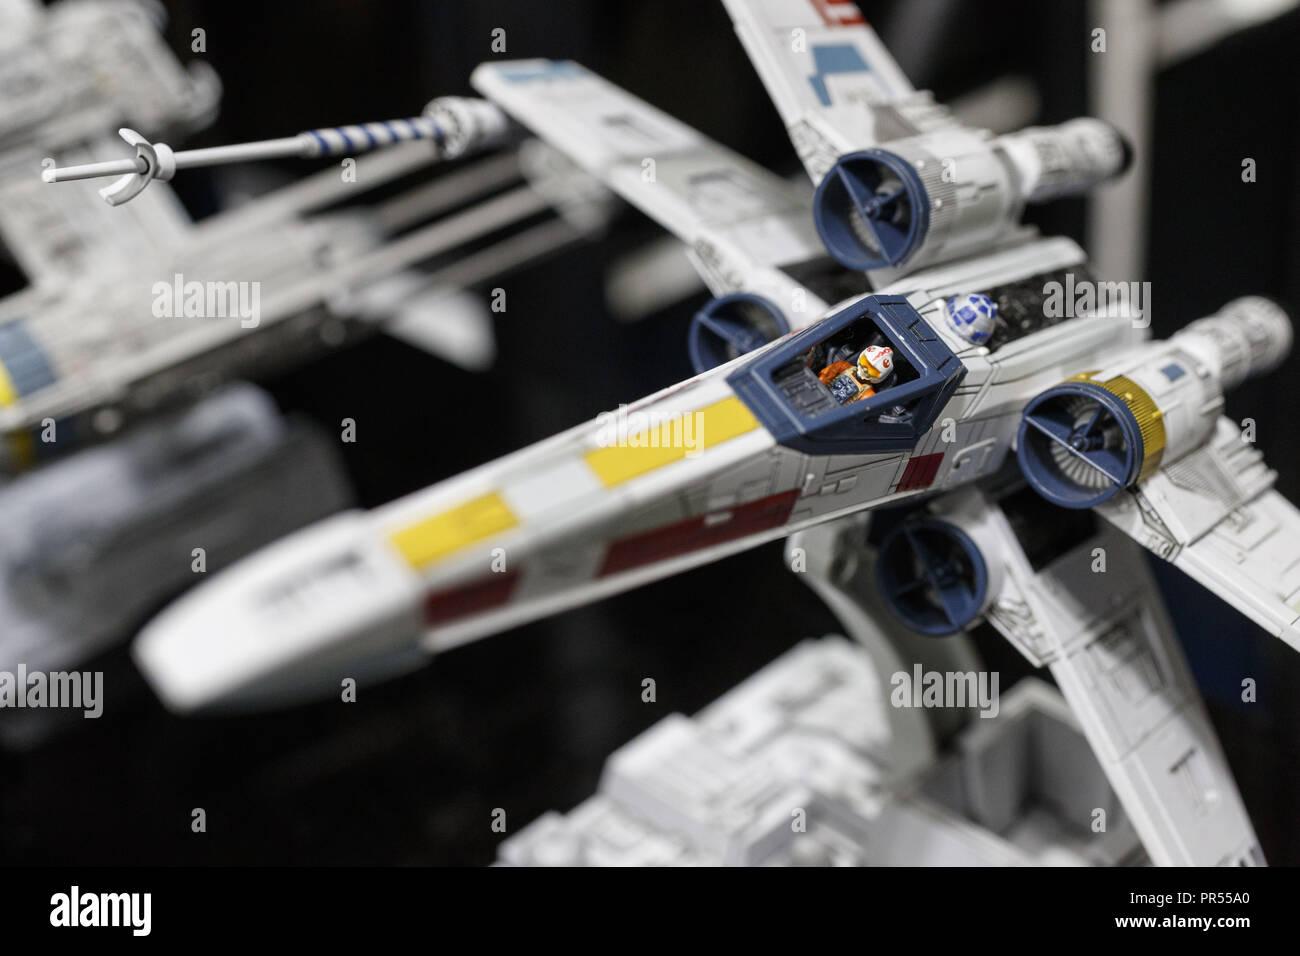 Tokyo, Japan  29th Sep, 2018  A Bandai Star Wars plastic model kit